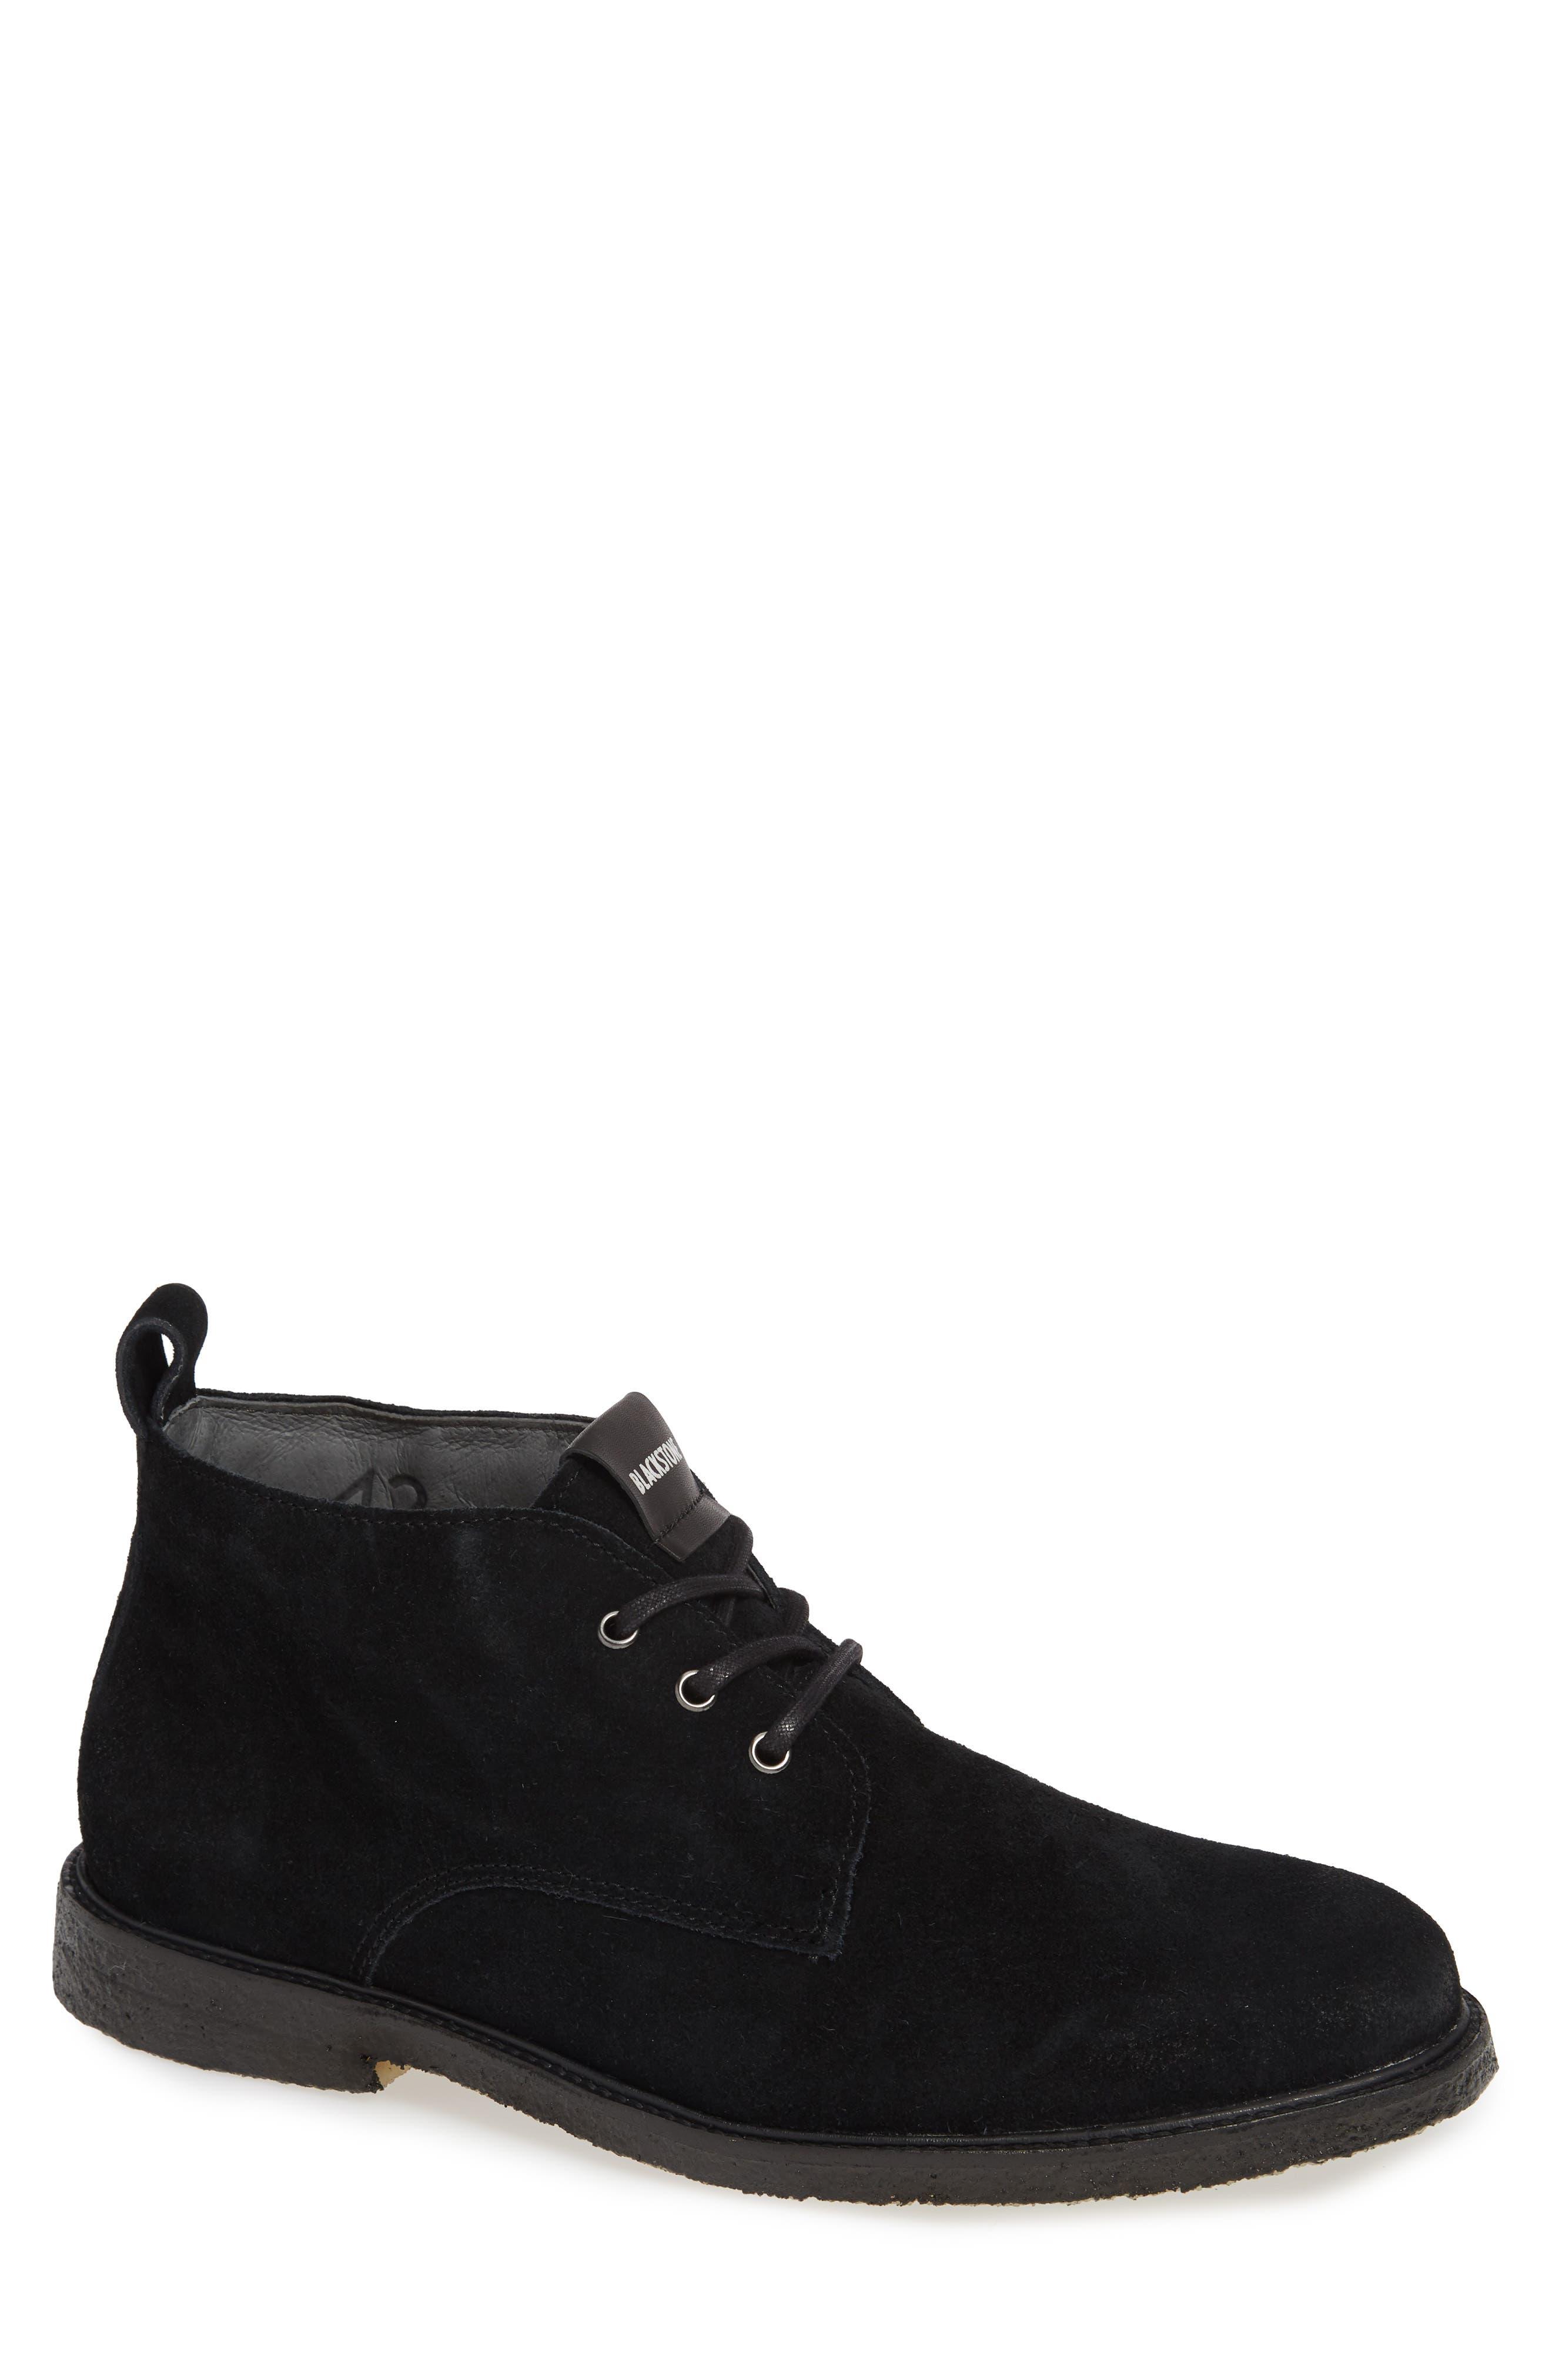 Blackstone Qm82 Chukka Boot, Black